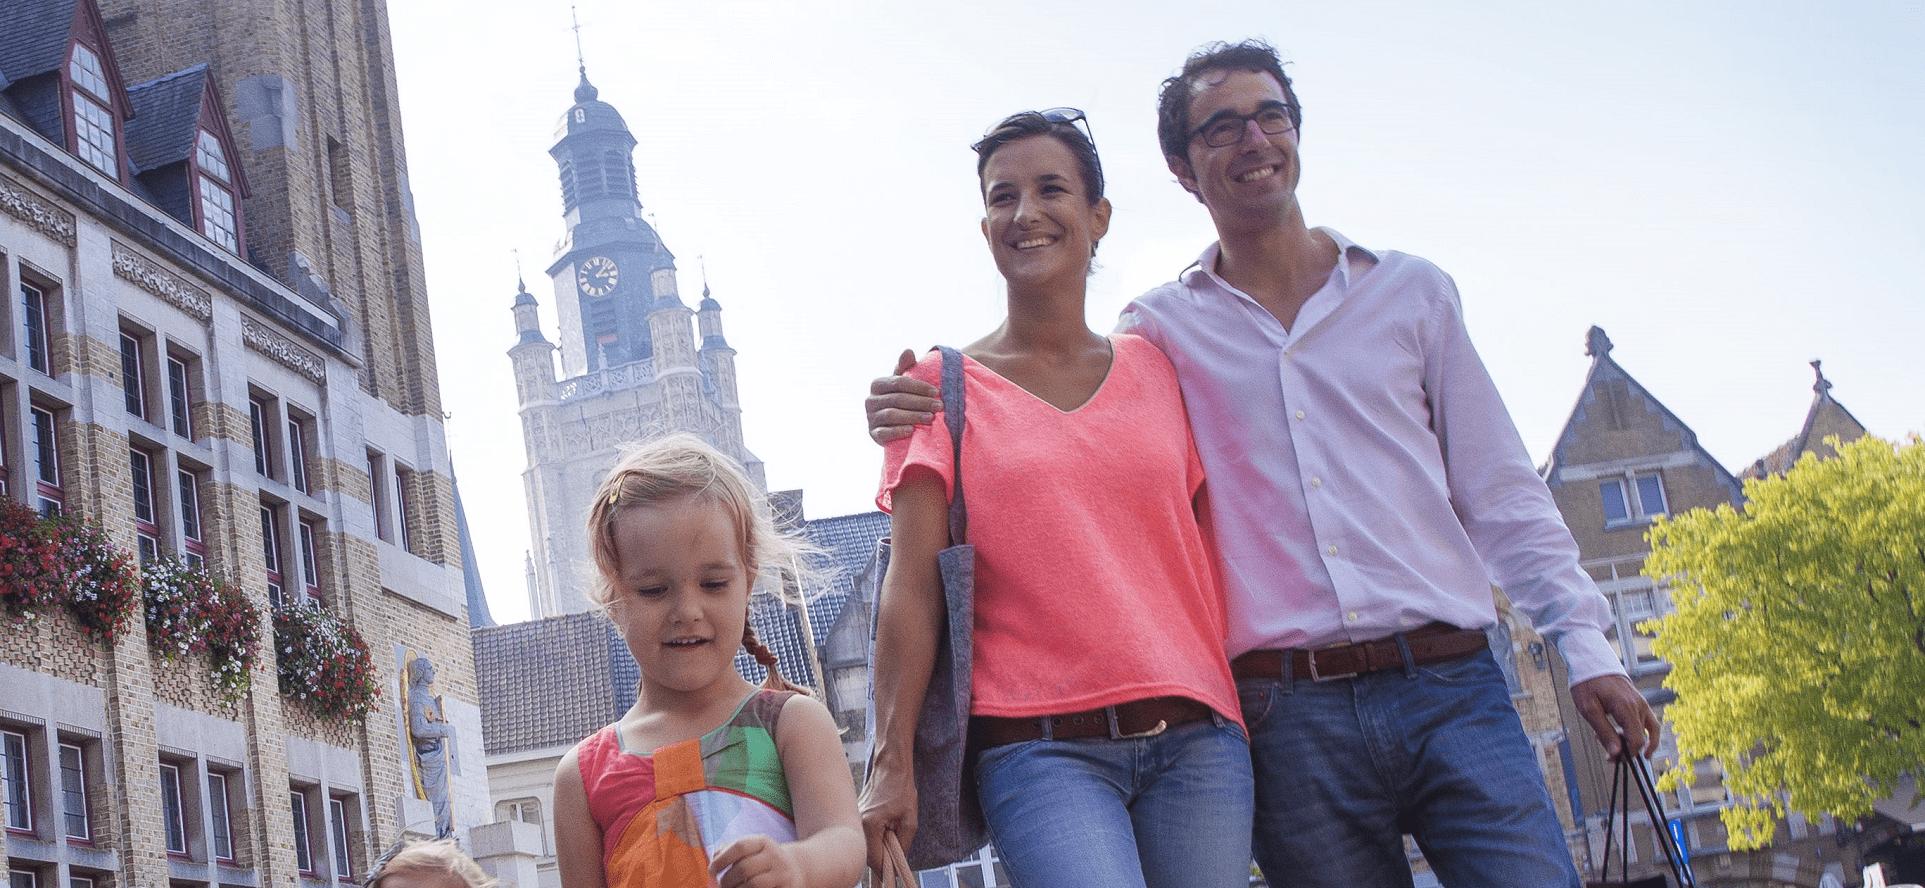 zomerzoektocht roeselare gezin